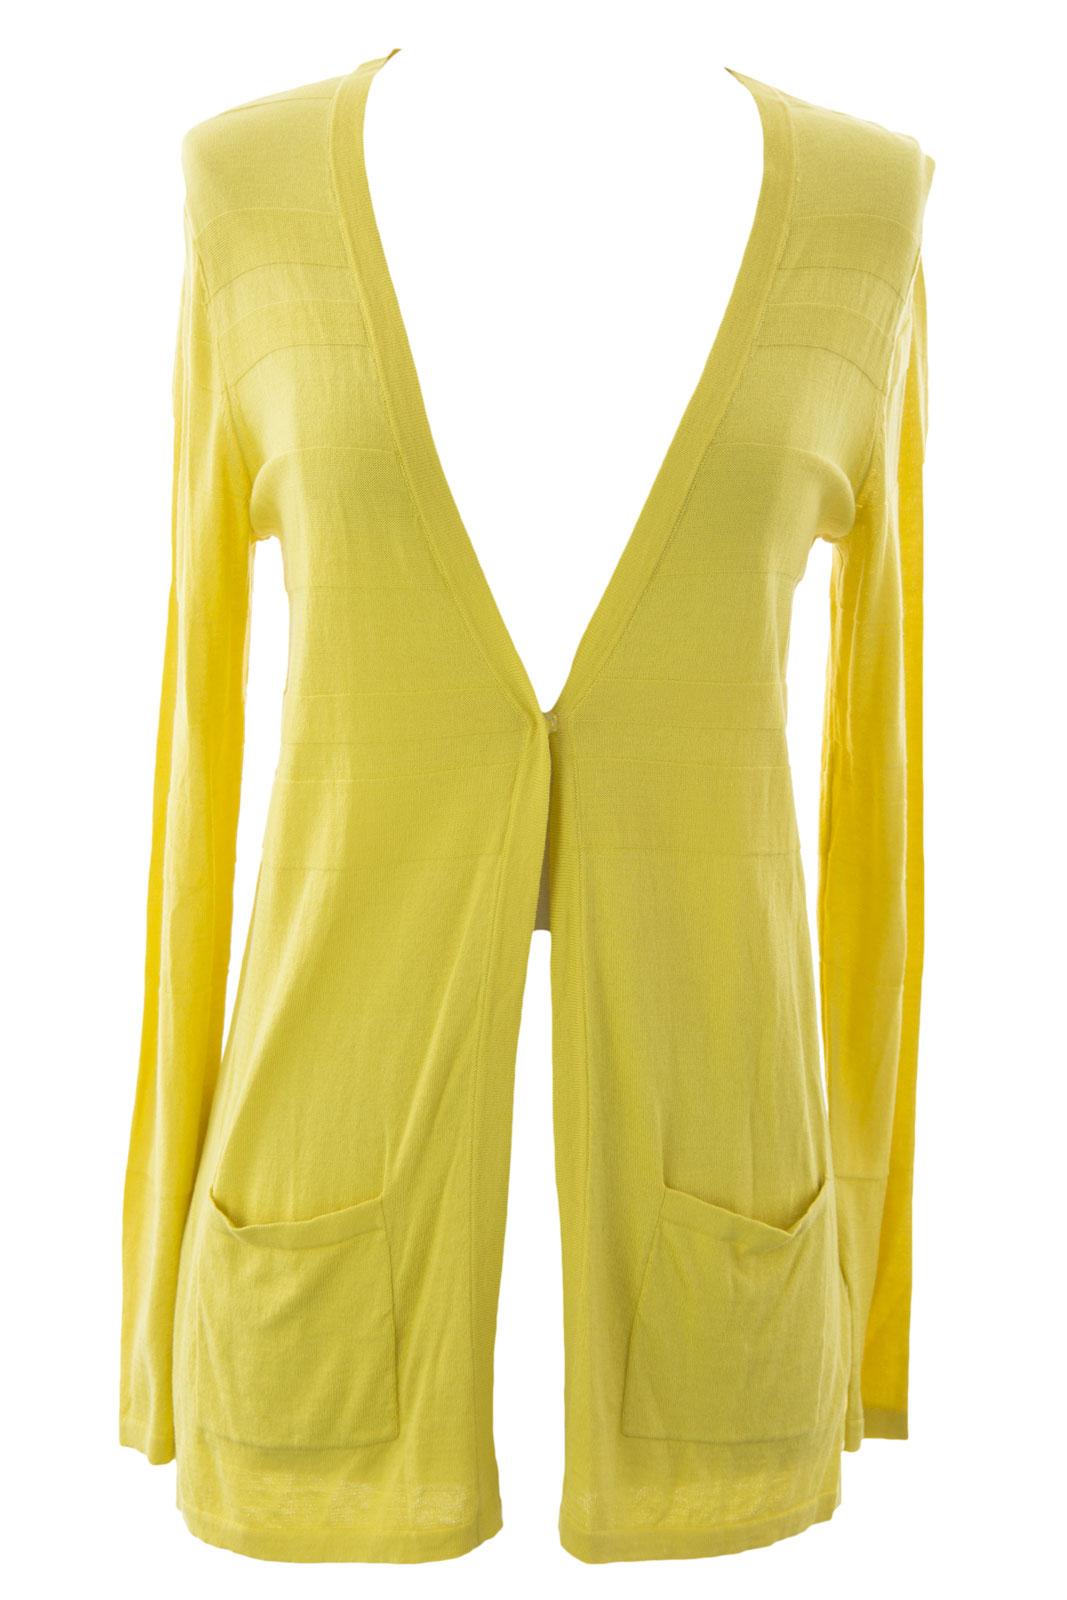 August Silk Women's Petite Textured Single Button Cardigan PXL ...